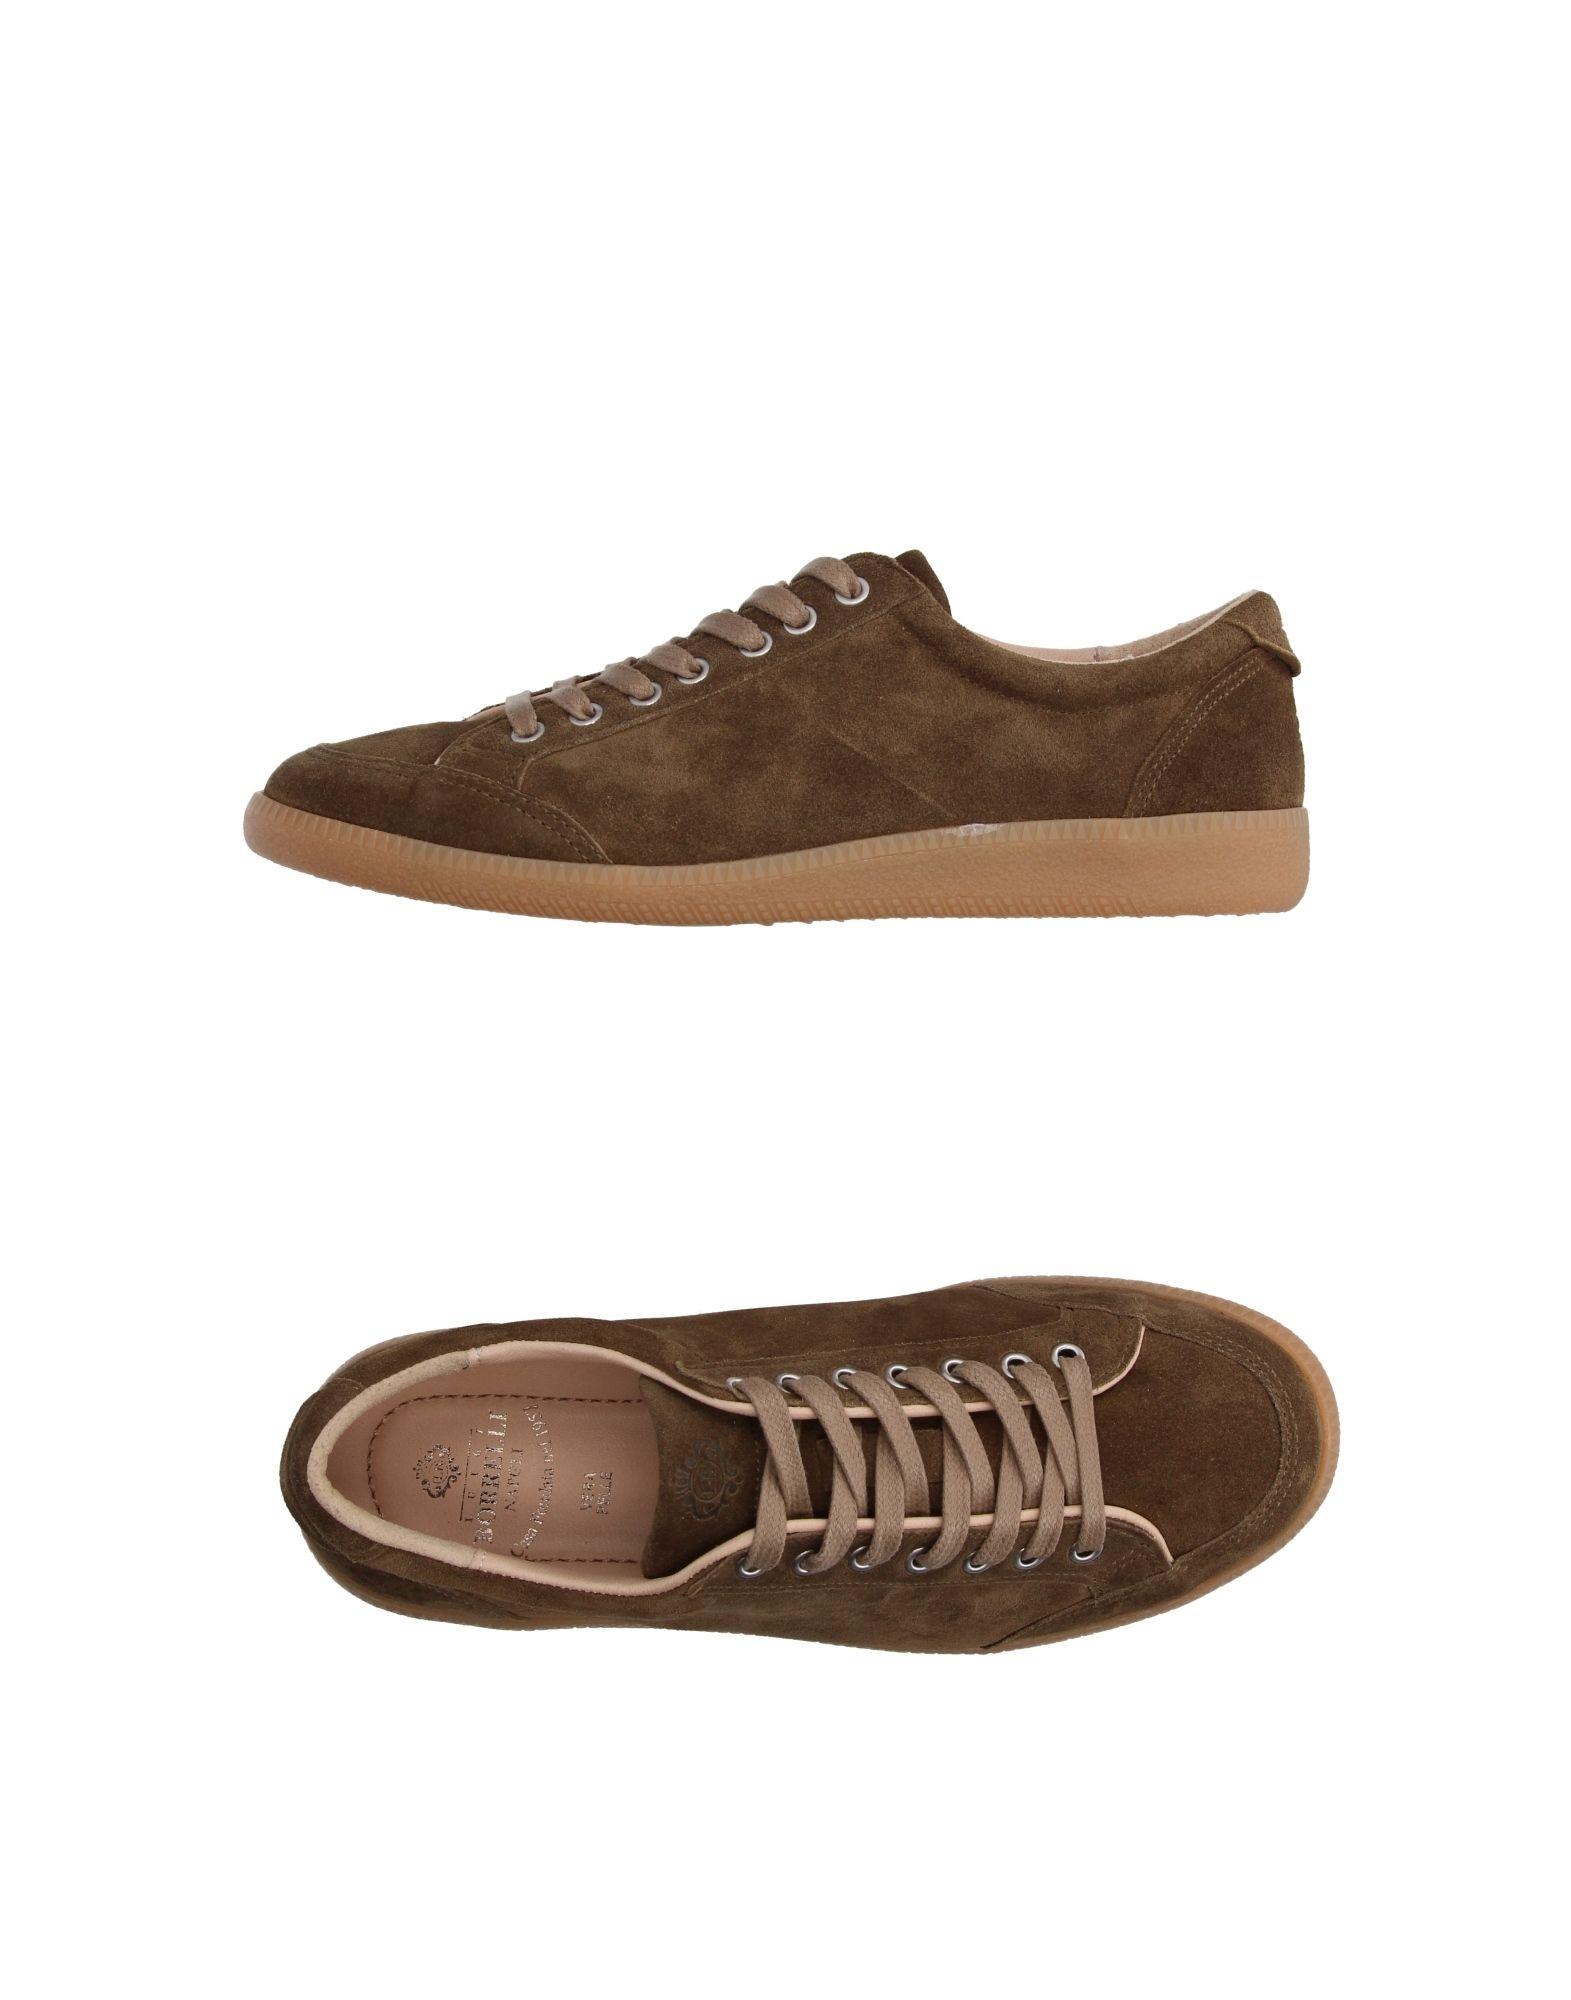 FOOTWEAR - Low-tops & sneakers on YOOX.COM LUIGI BORRELLI NAPOLI bMEdD